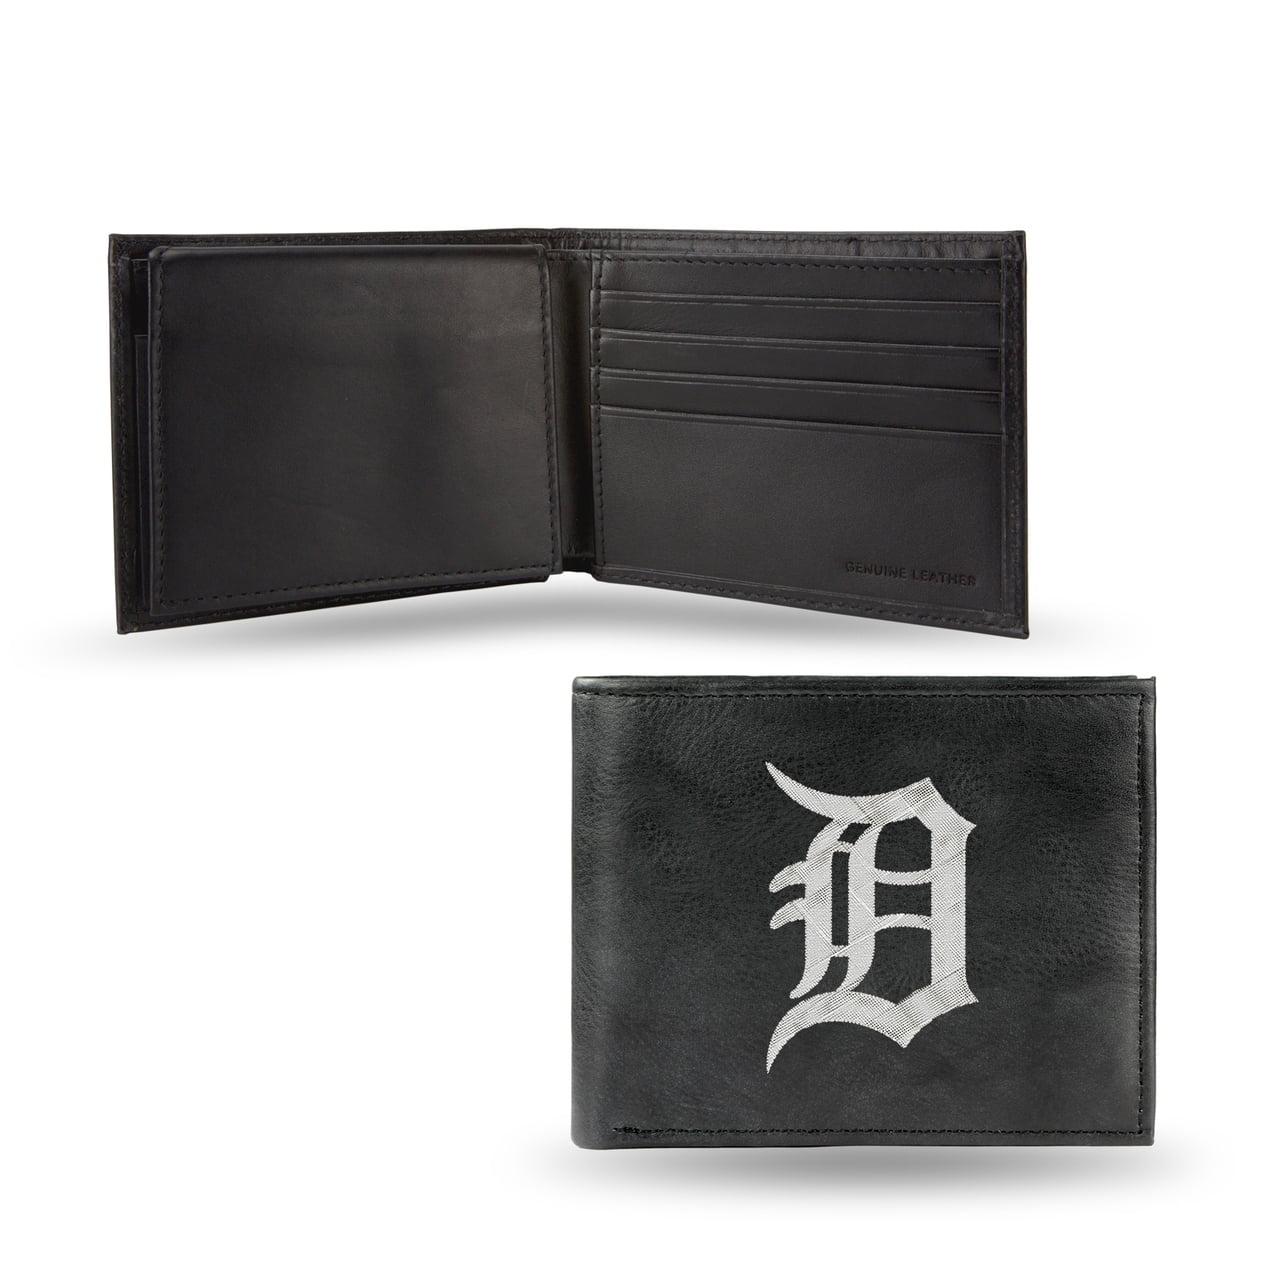 Detroit Tigers Embroidered Billfold - image 1 de 1